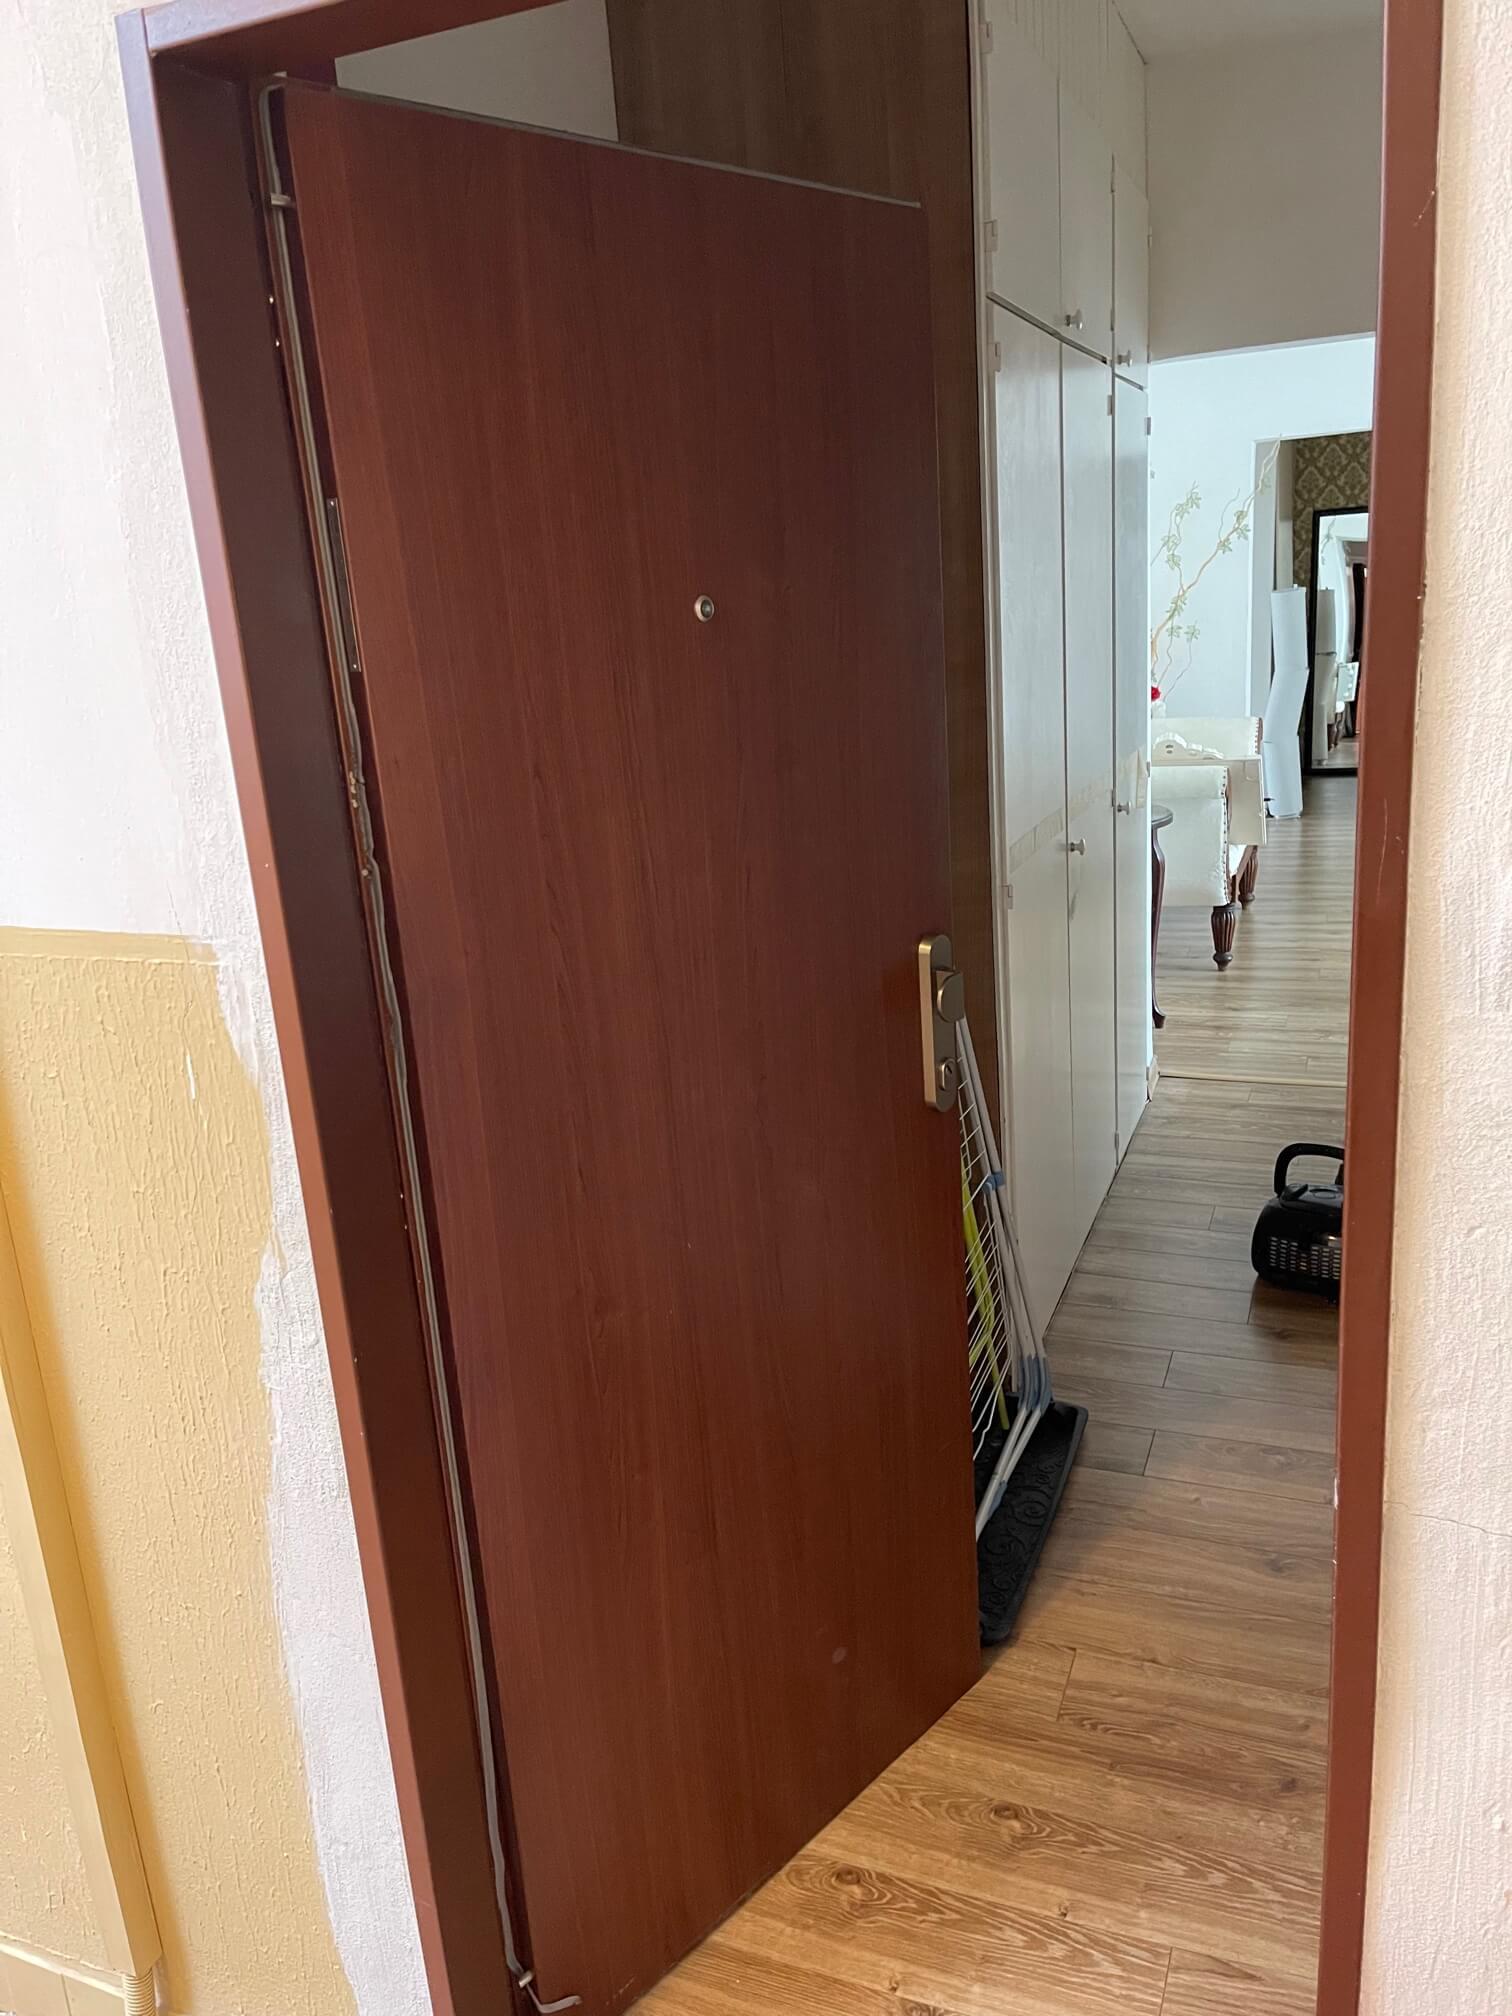 Exkluzívne na prenájom 3 izbový byt, 83m2, 2x loggia 4,5m2, Karolovka, Janotová 8-18